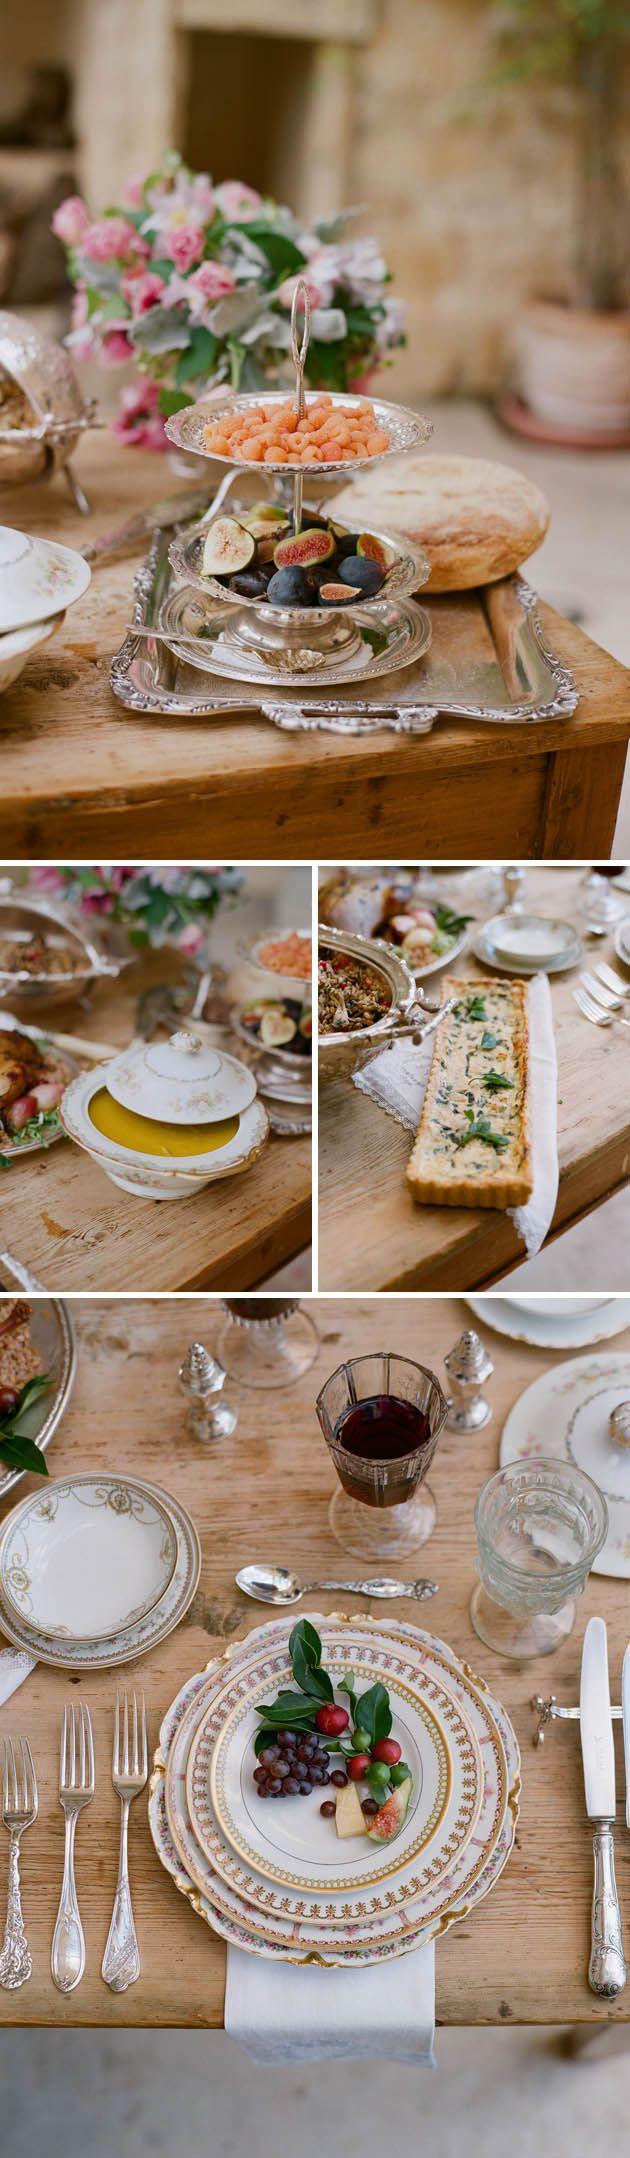 Wedding Dinner Ideas  elegant wedding dinner ideas